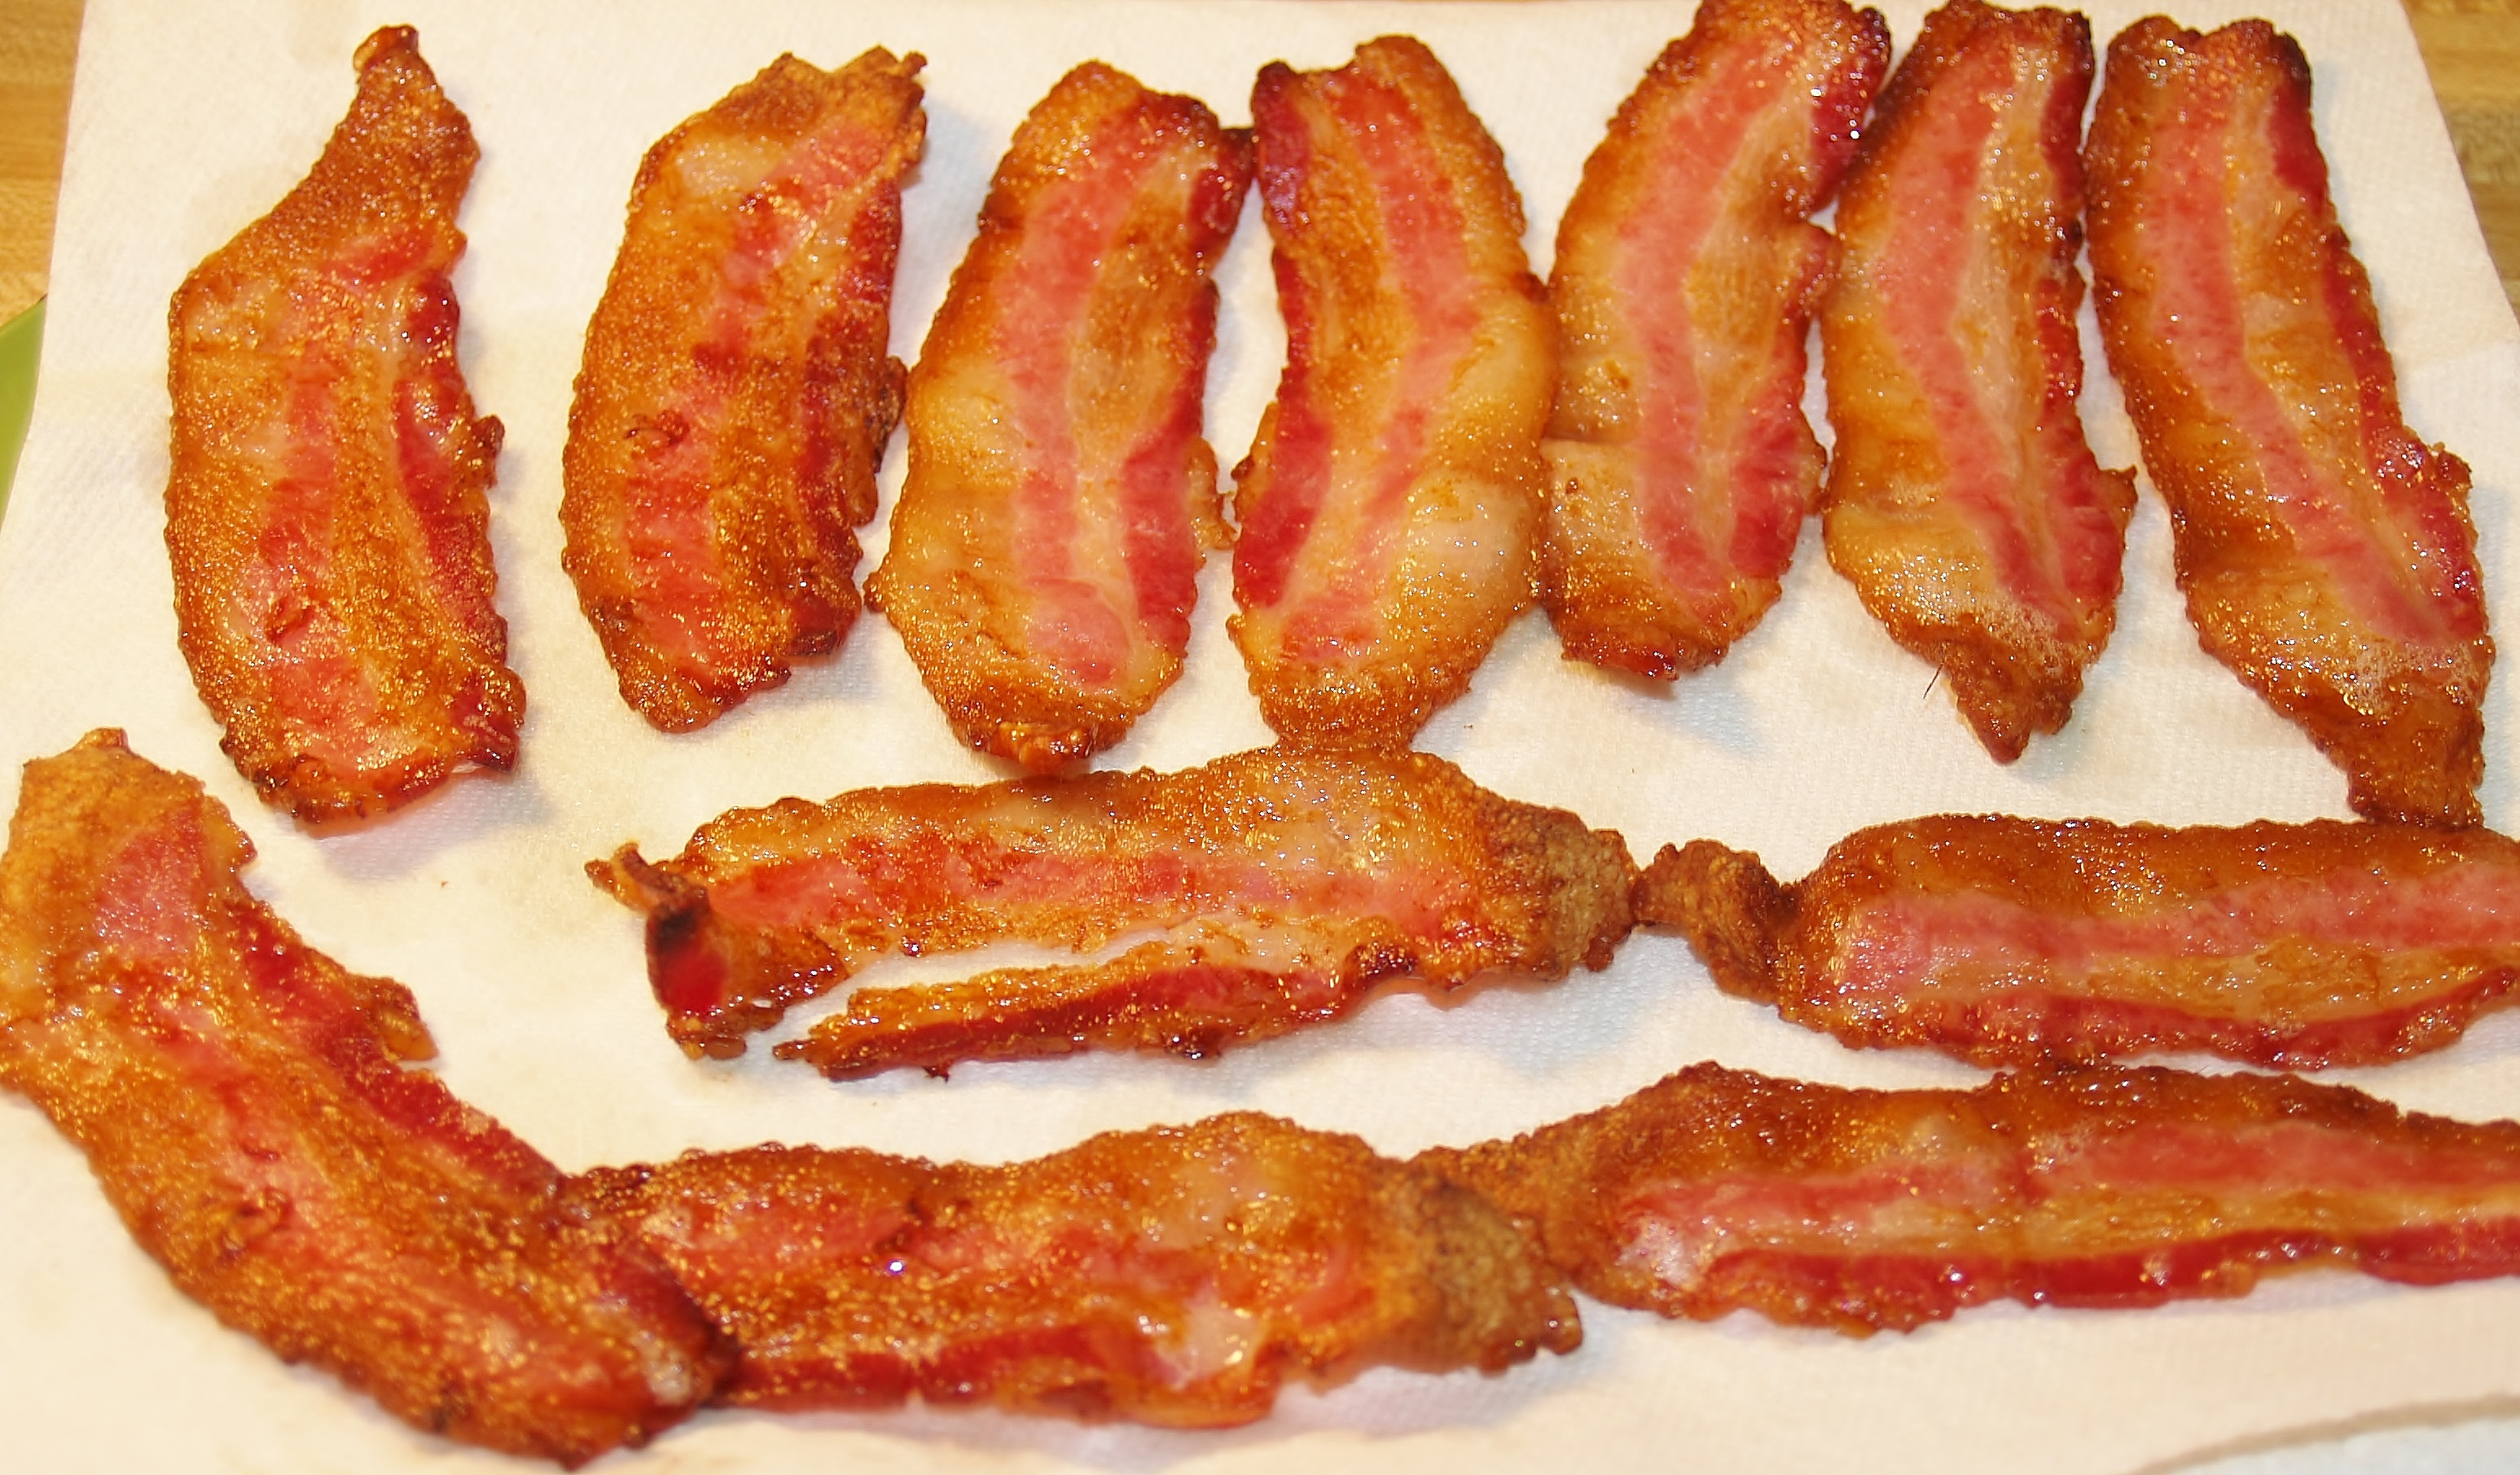 Bakin' Bacon Baked